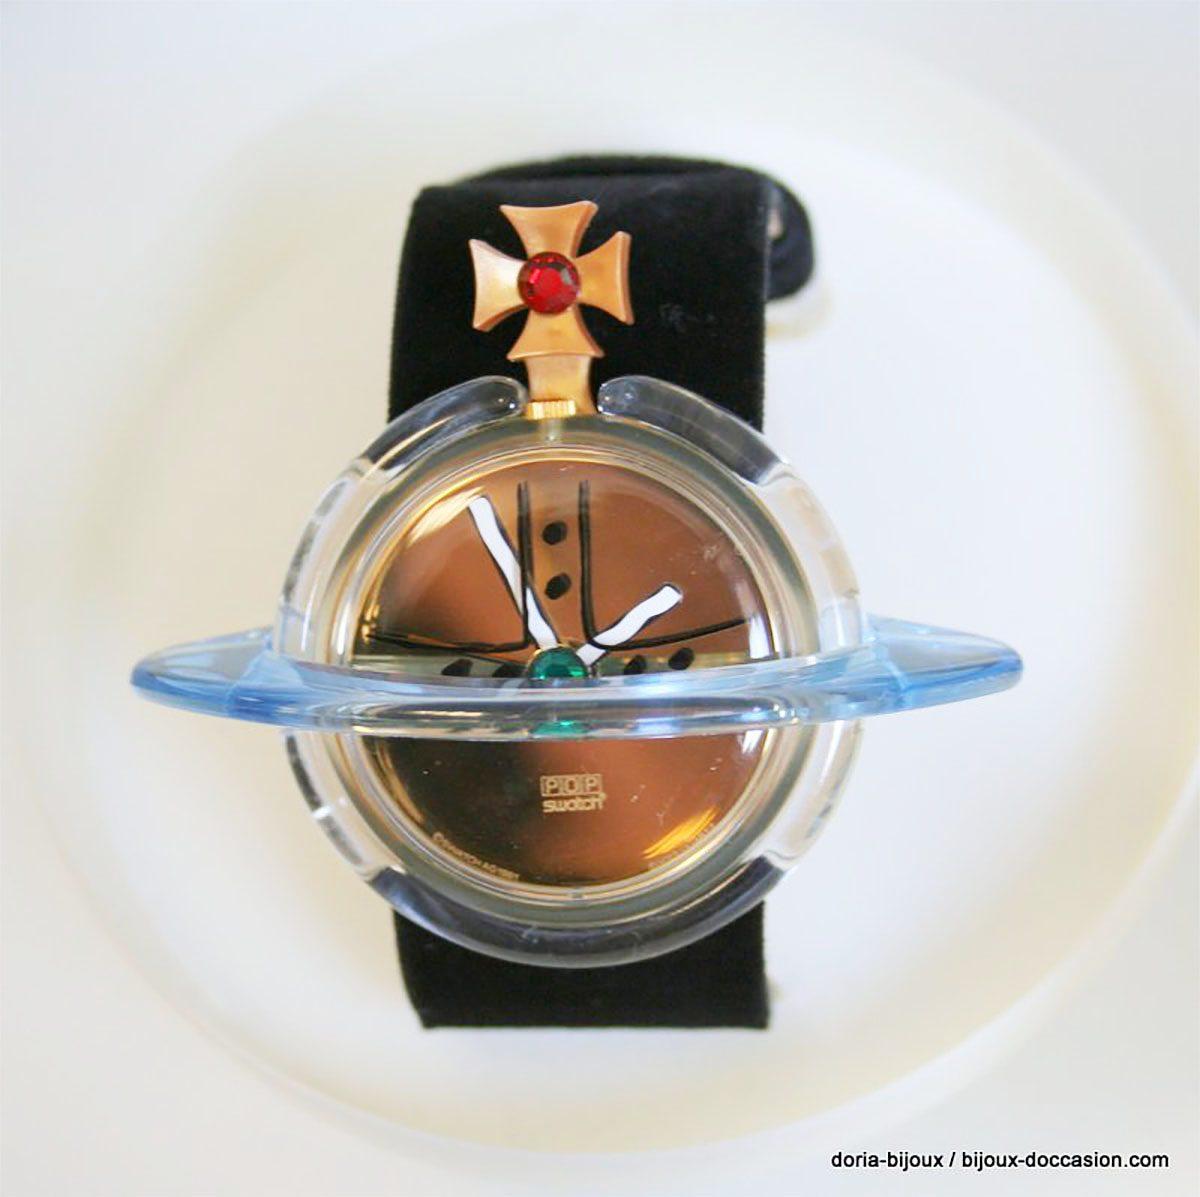 Montre Swatch By Vivienne Westwood Pwz104 Neuve